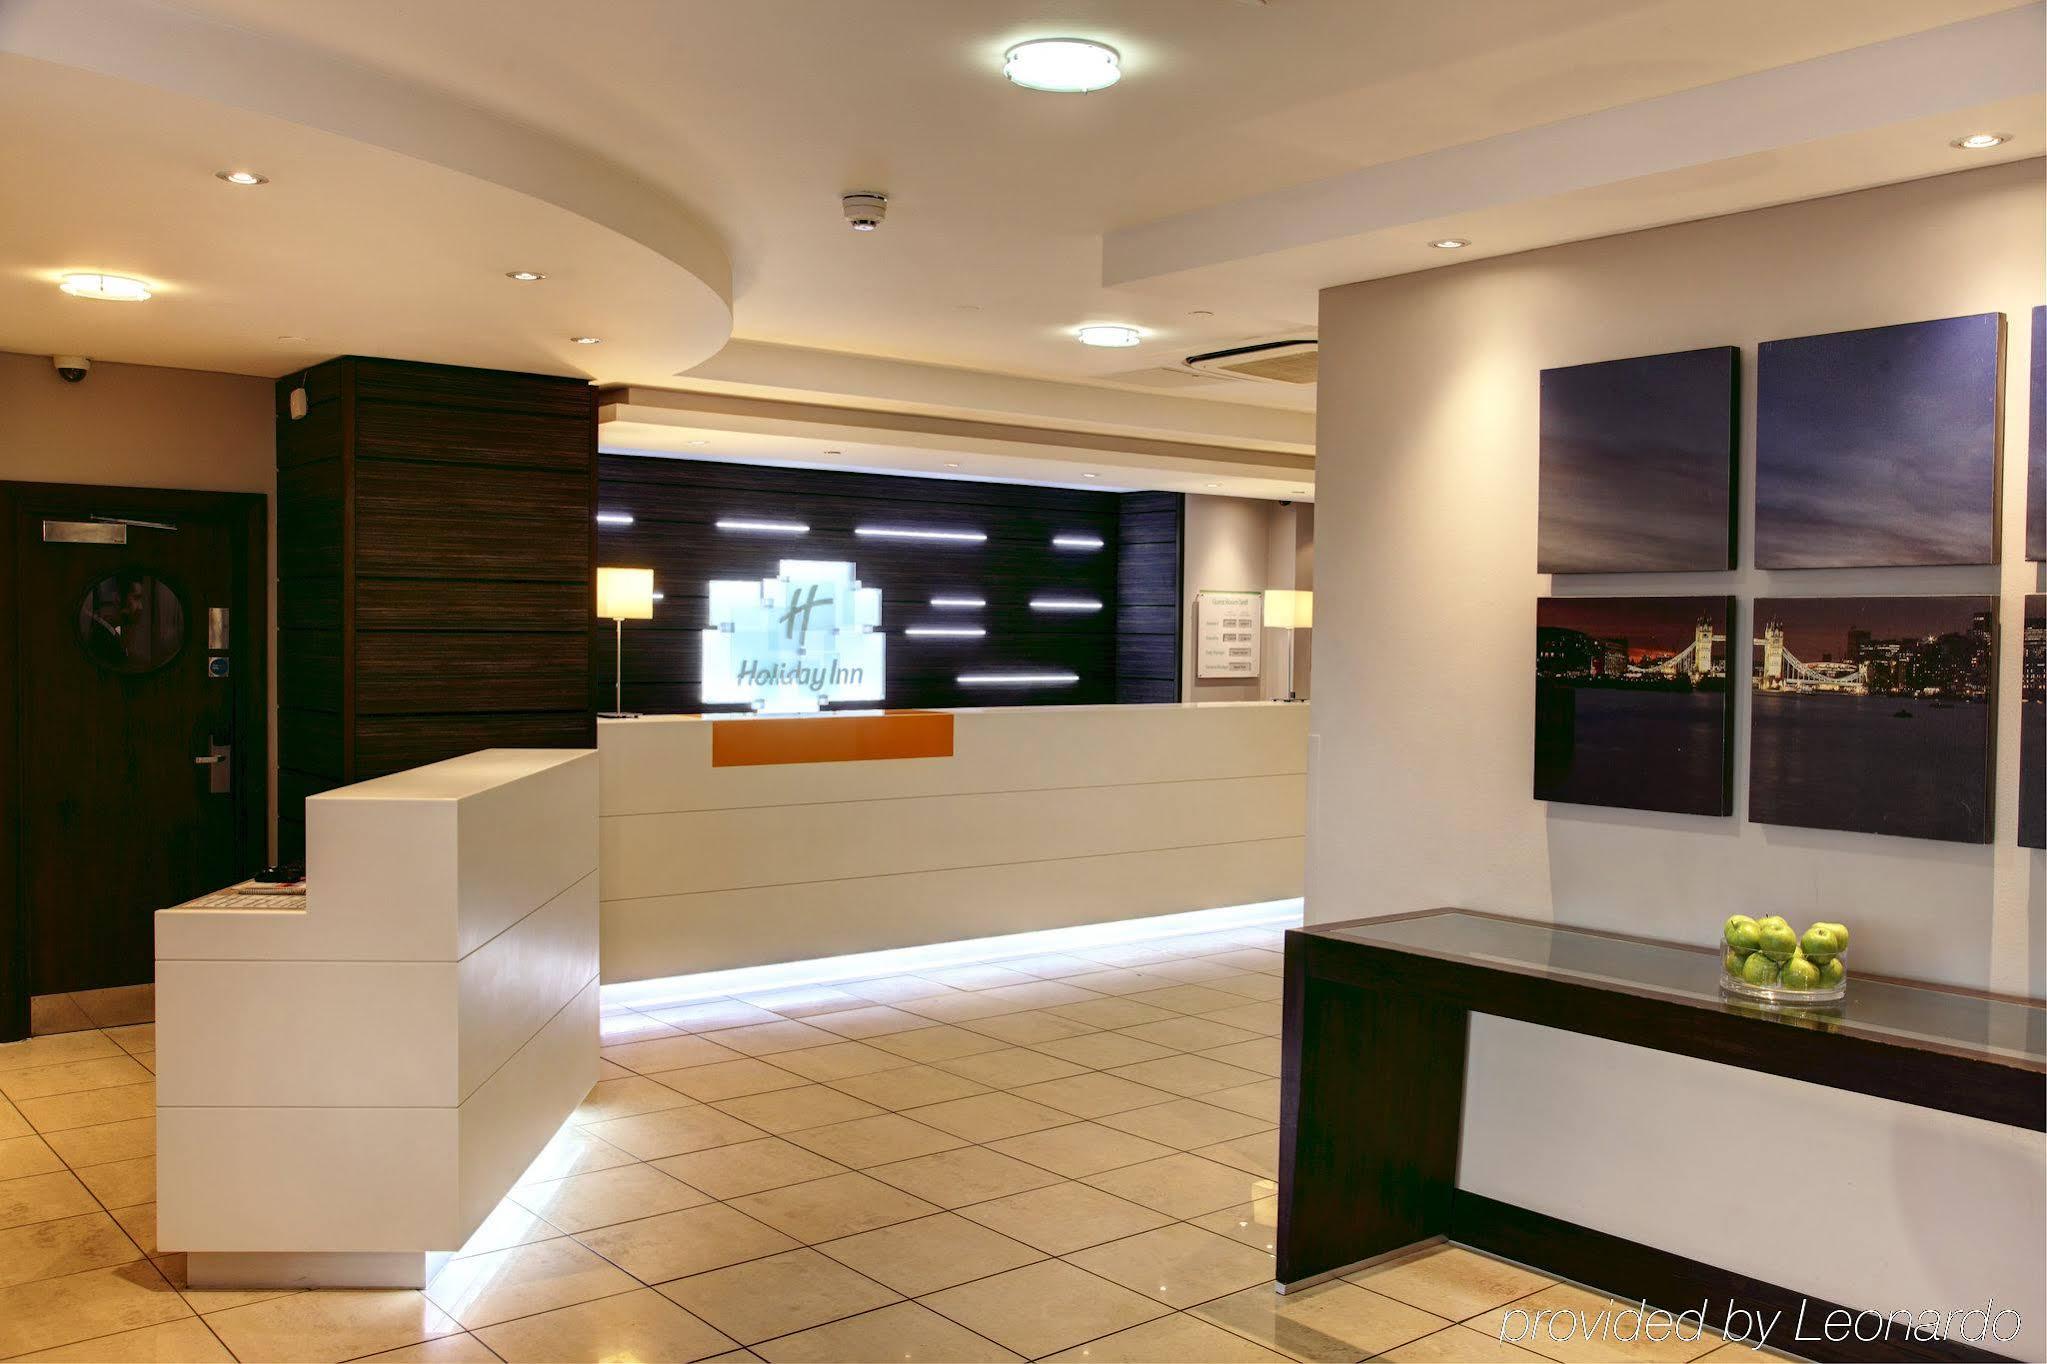 Regents Park London Hotels  Star